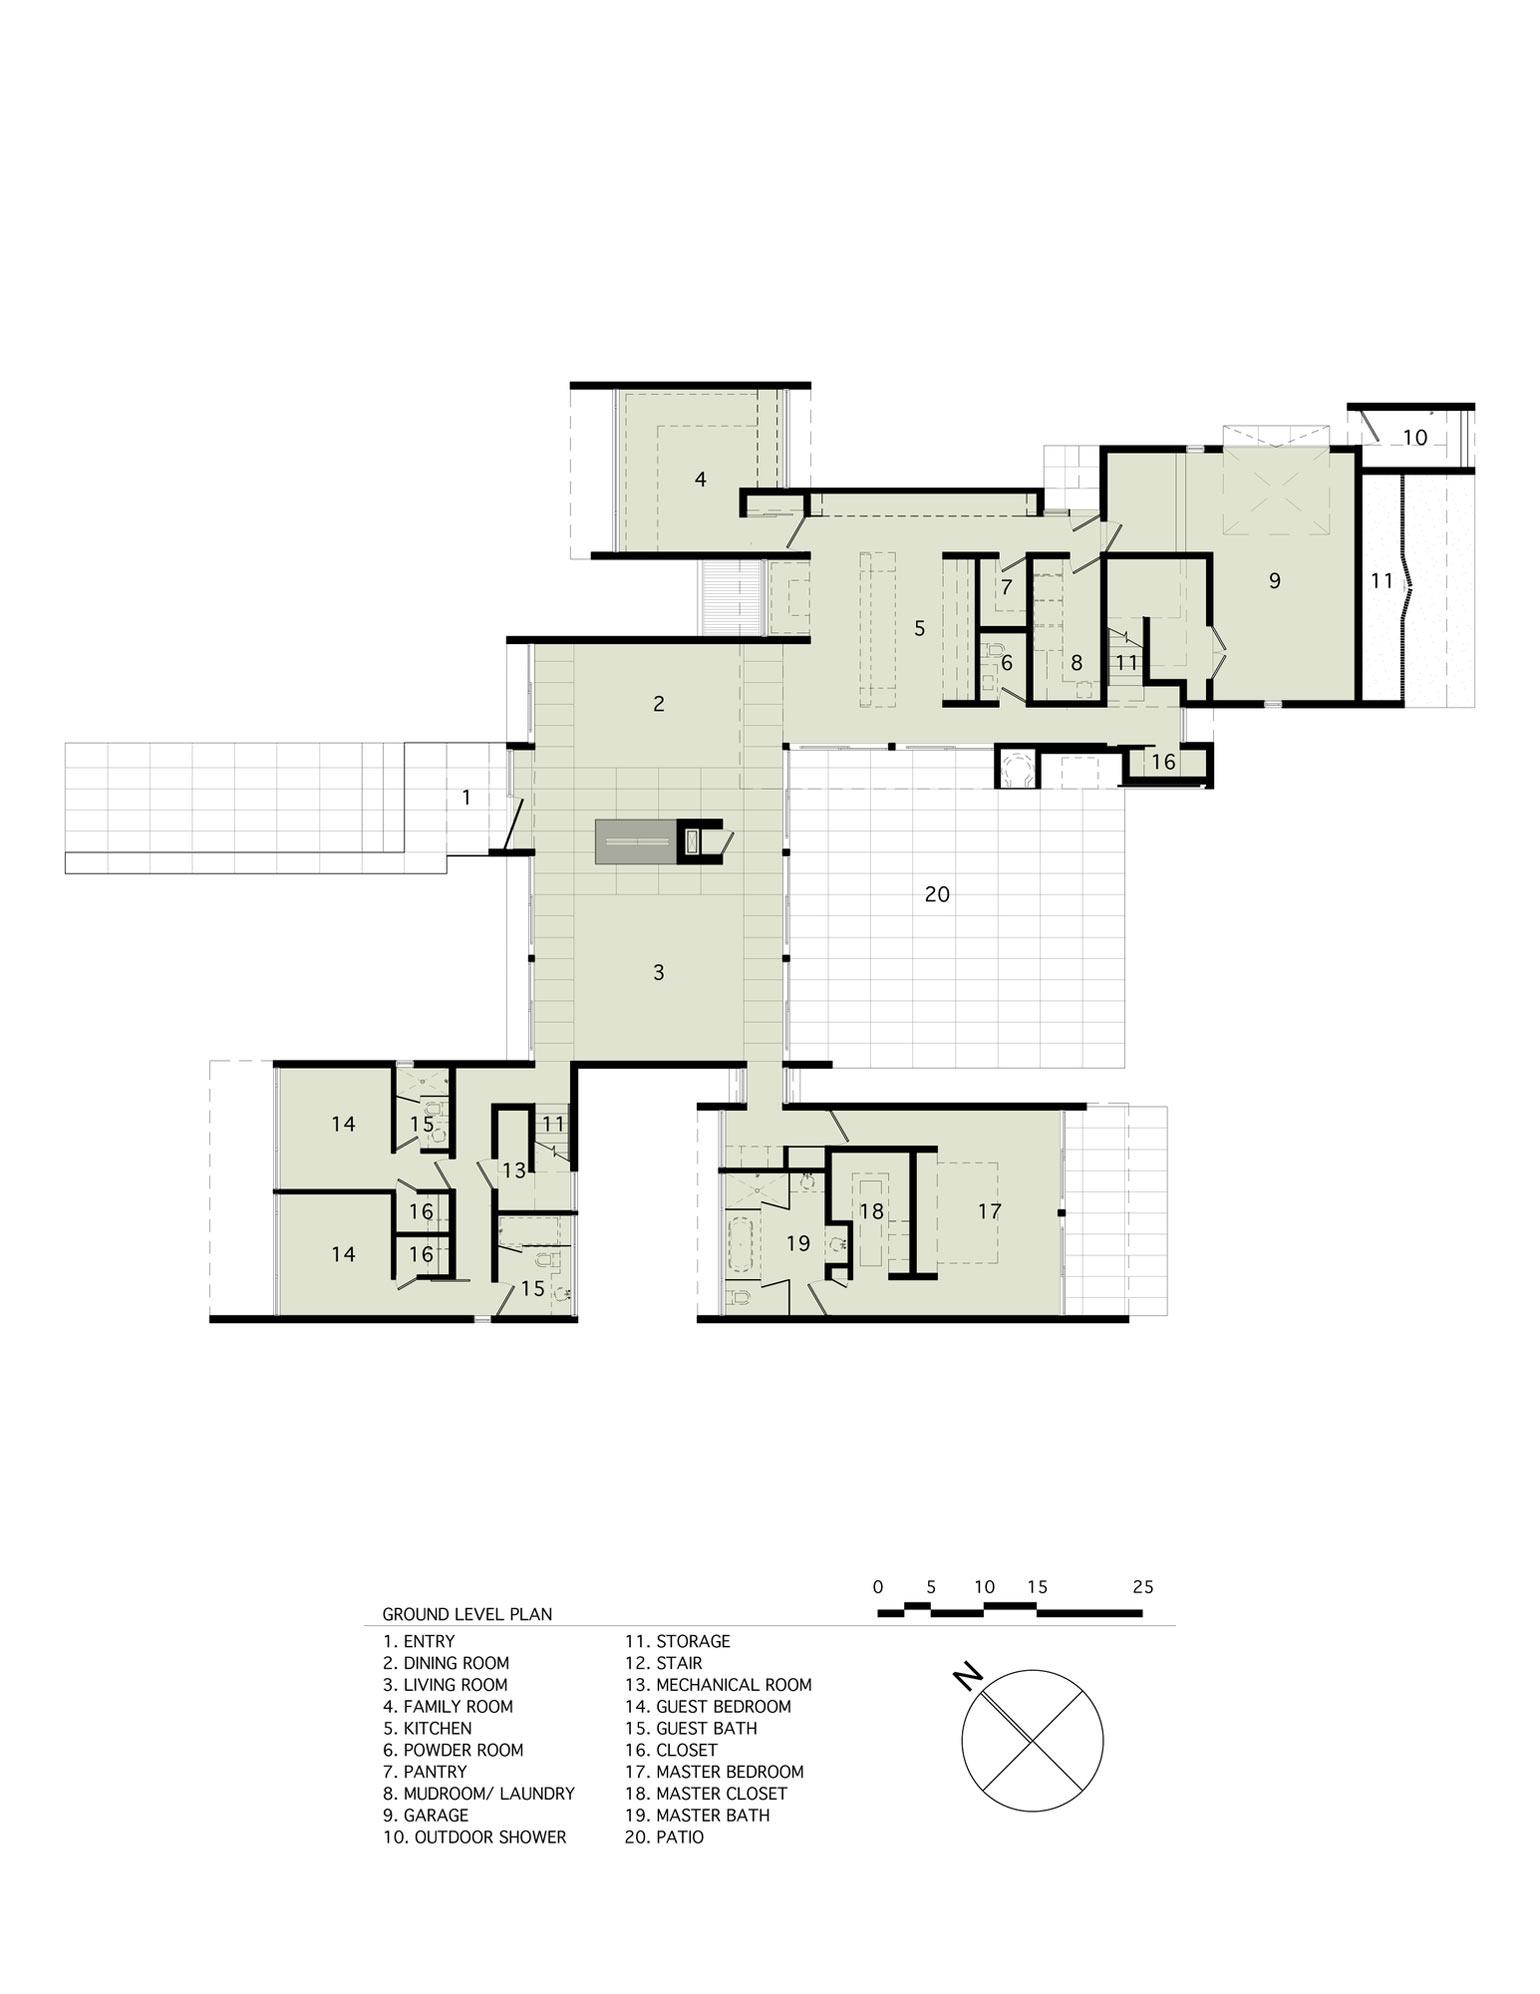 Ground Floor Plan, Sam's Creek in Bridgehampton, New York by Bates Masi Architects